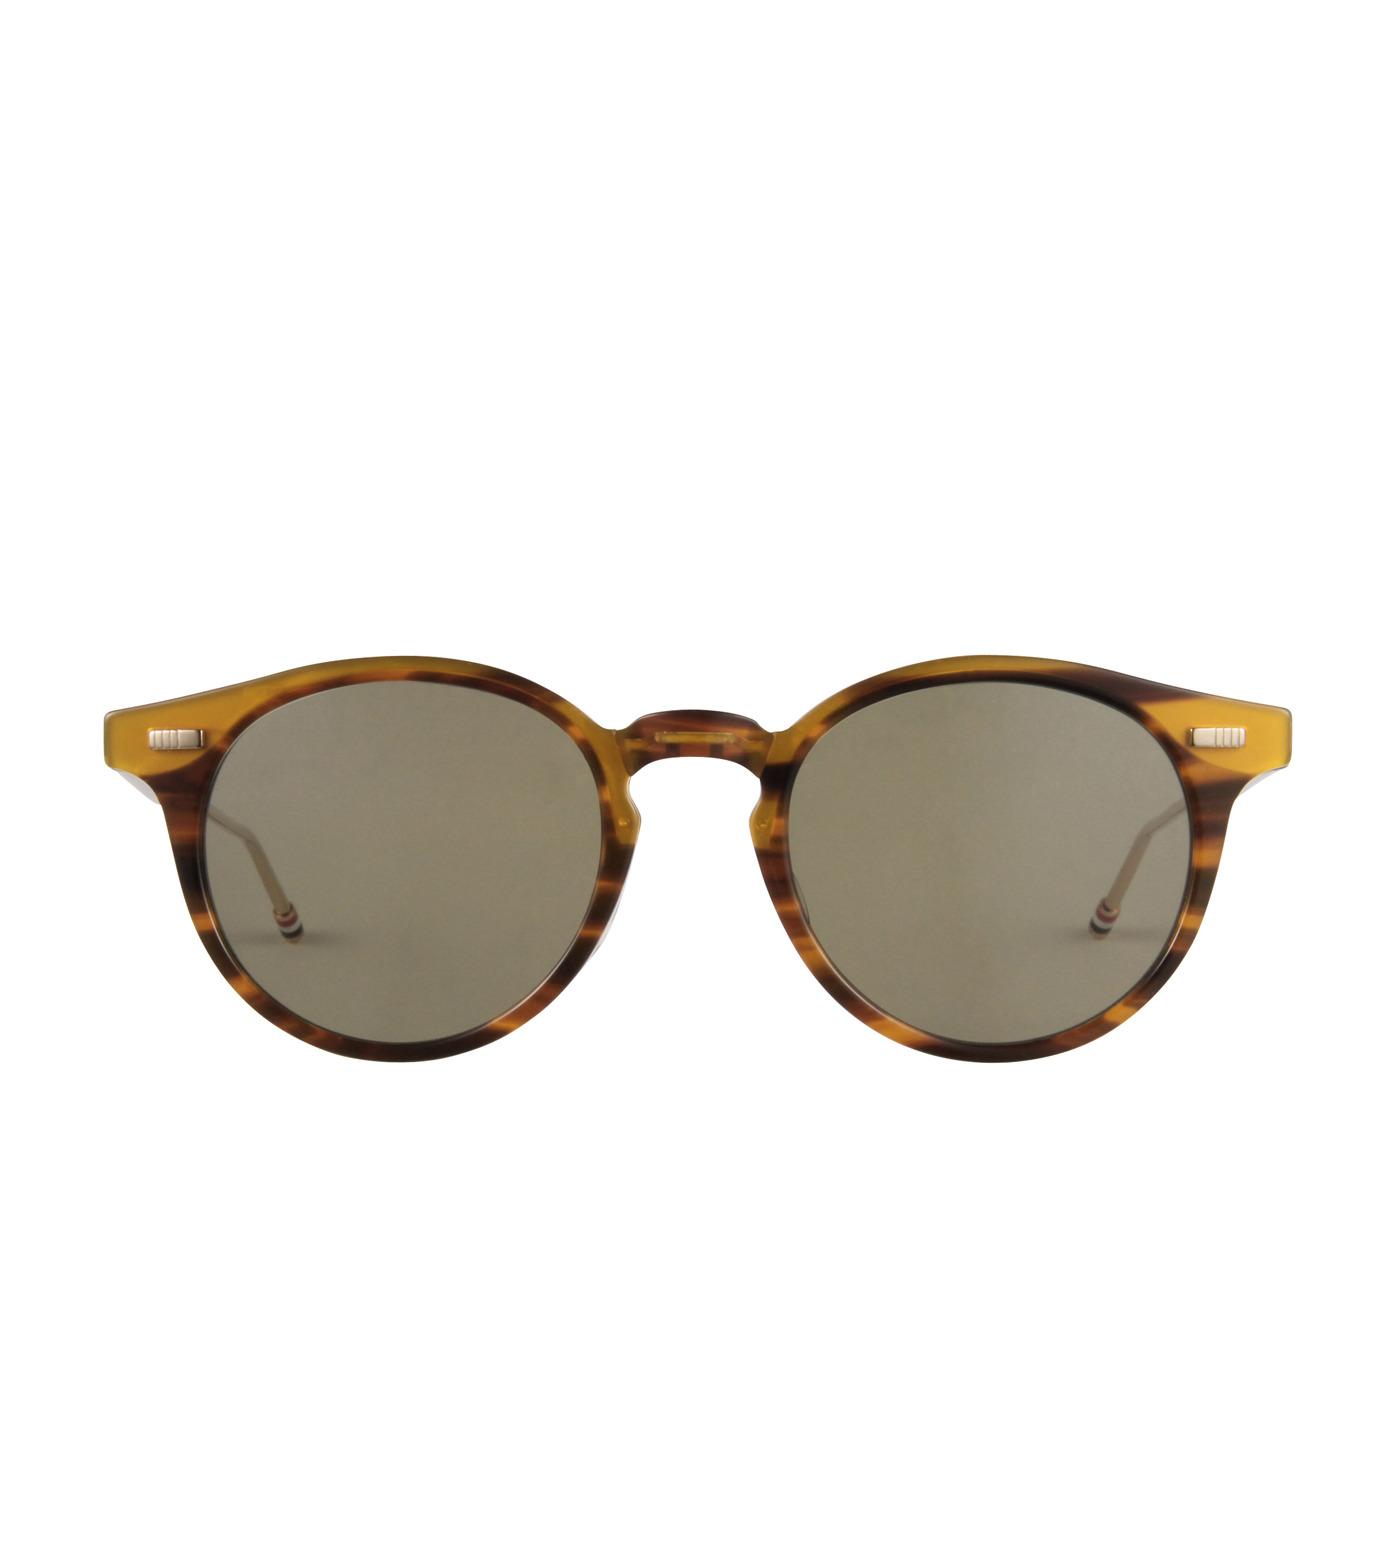 Thom Browne Eye Wear(トム・ブラウン・アイウェア)のFolding Roundframe-YELLOW(アイウェア/eyewear)-TB-806-B-32 拡大詳細画像3